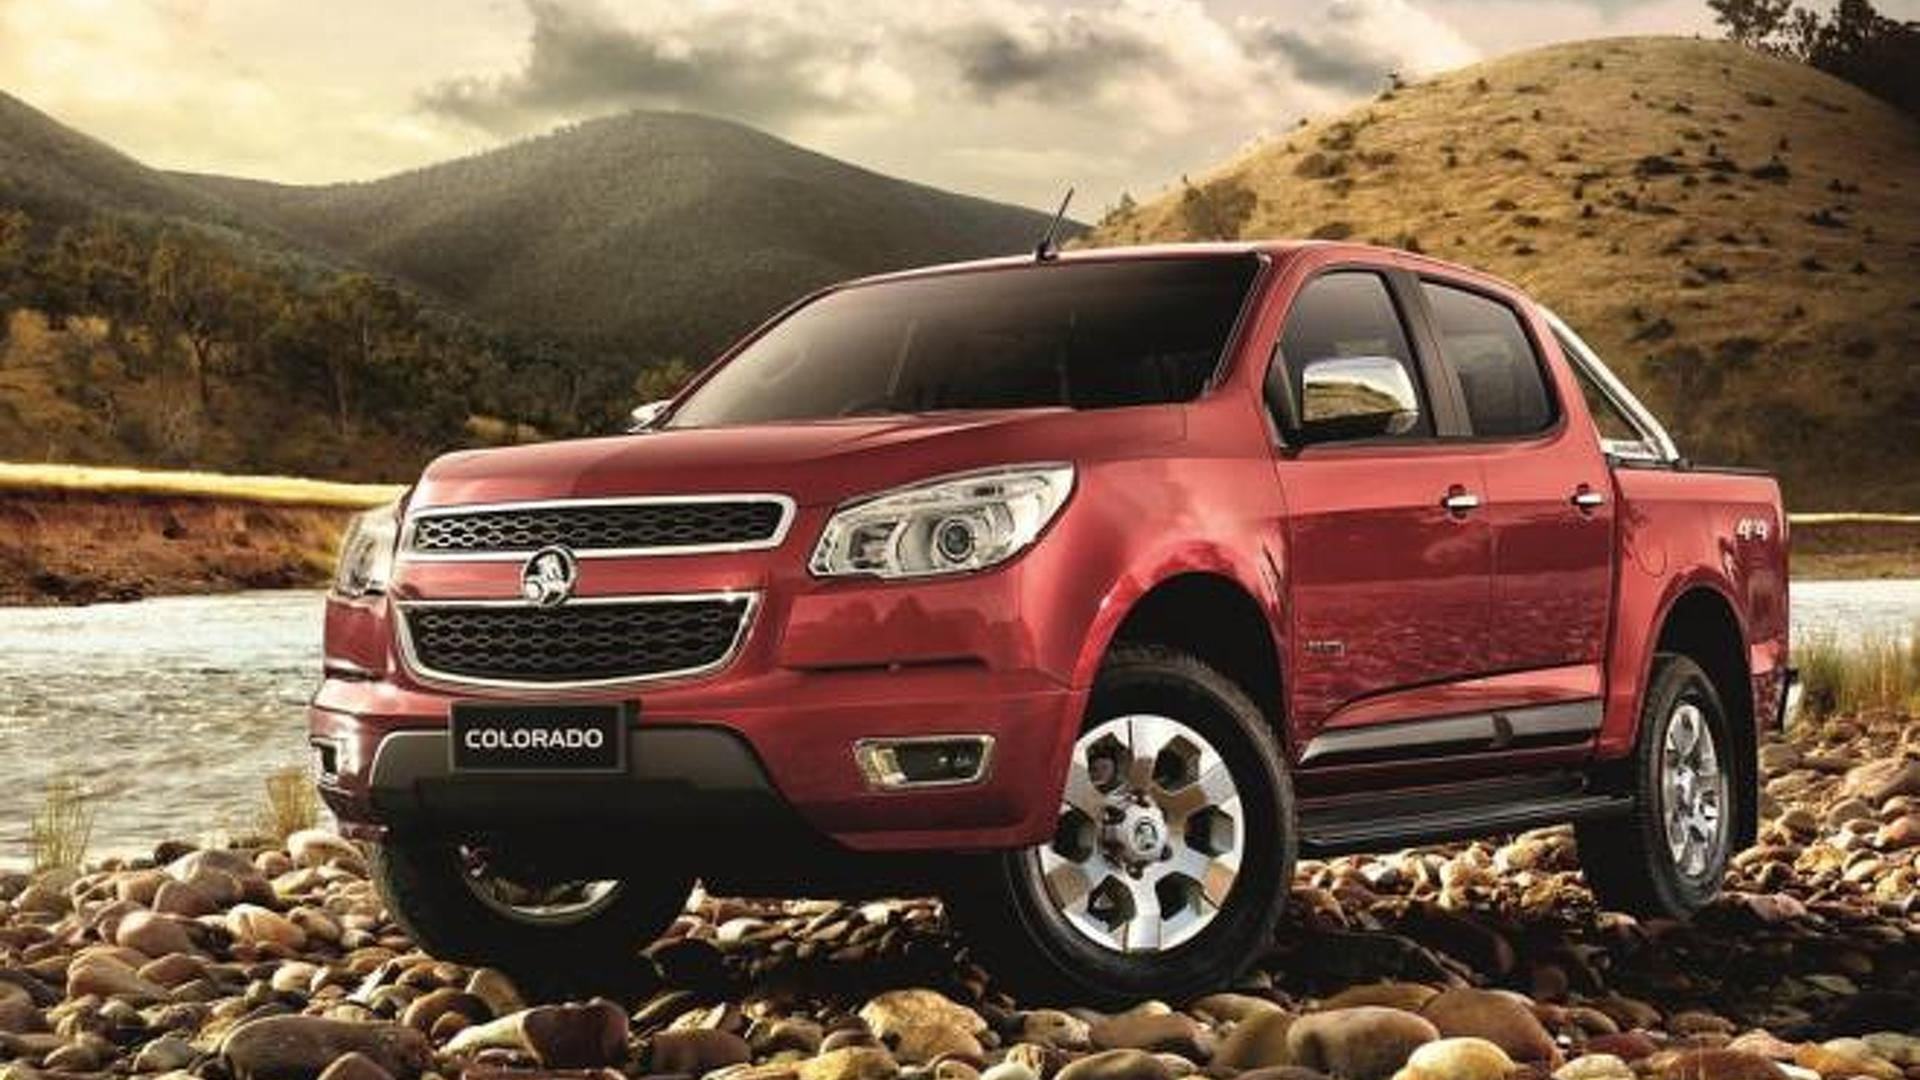 2012 Holden Colorado revealed